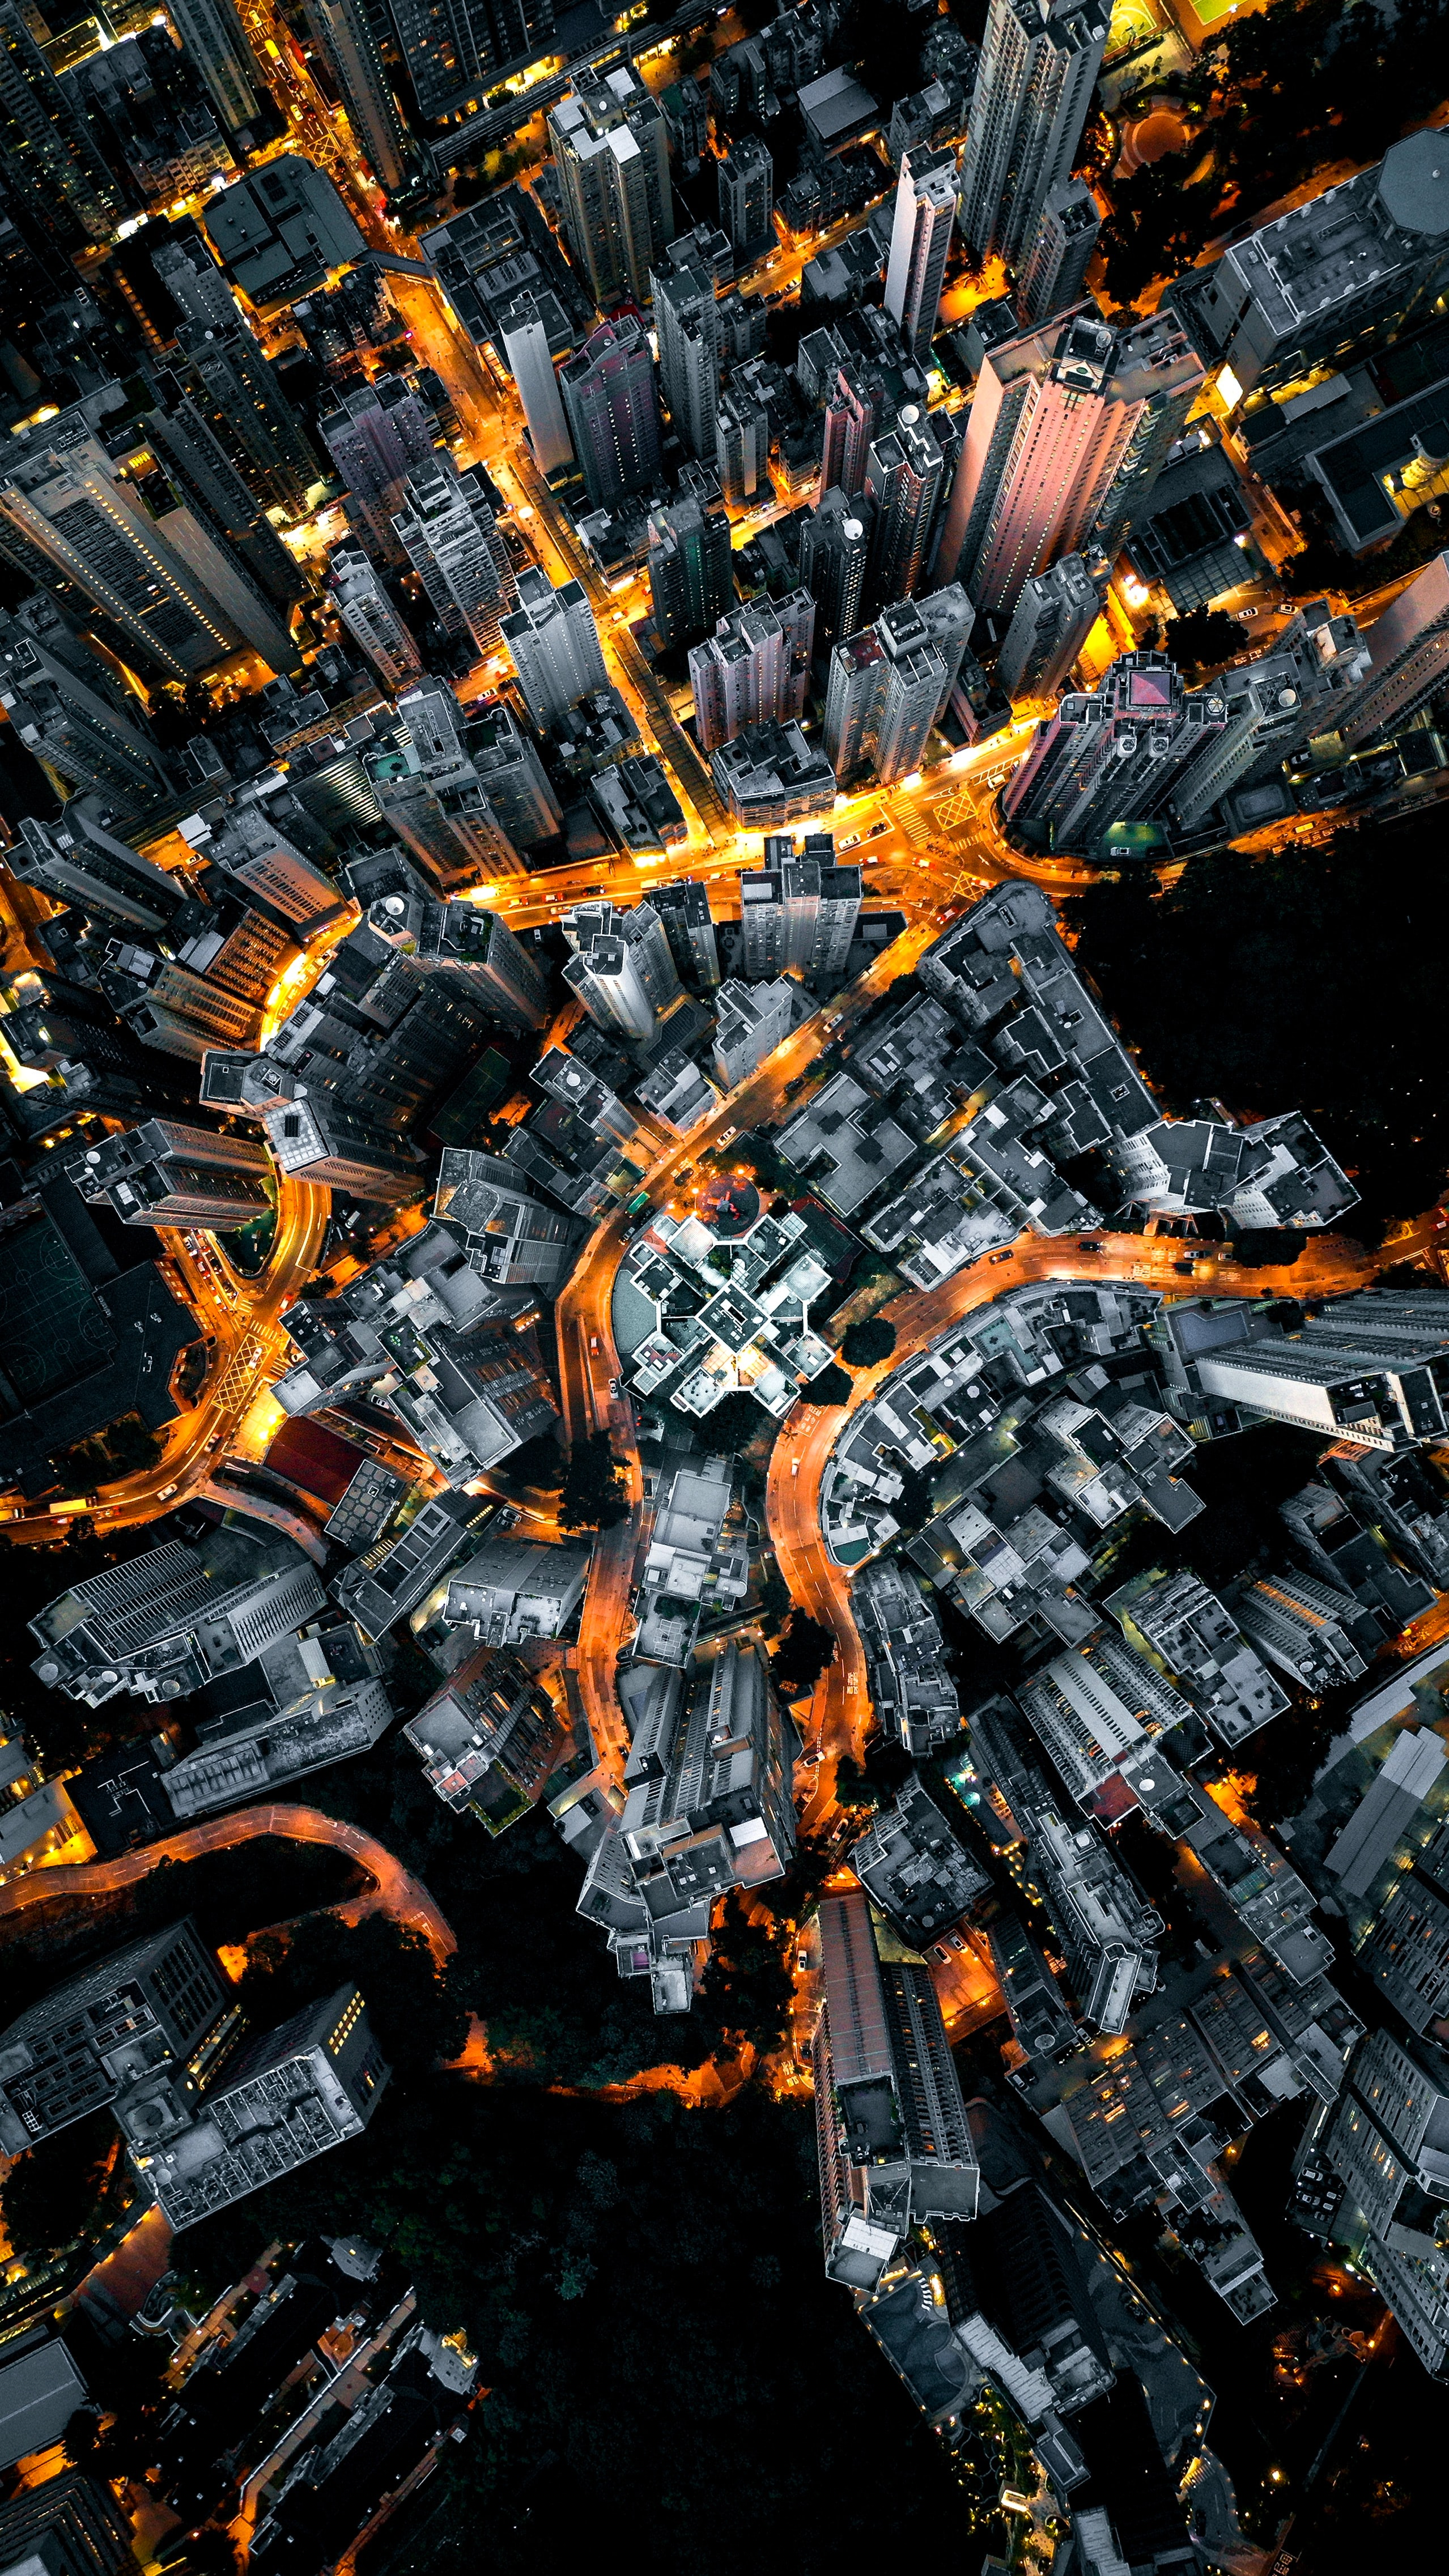 xiang-ji-UwPDjANCoJI-unsplash.jpg